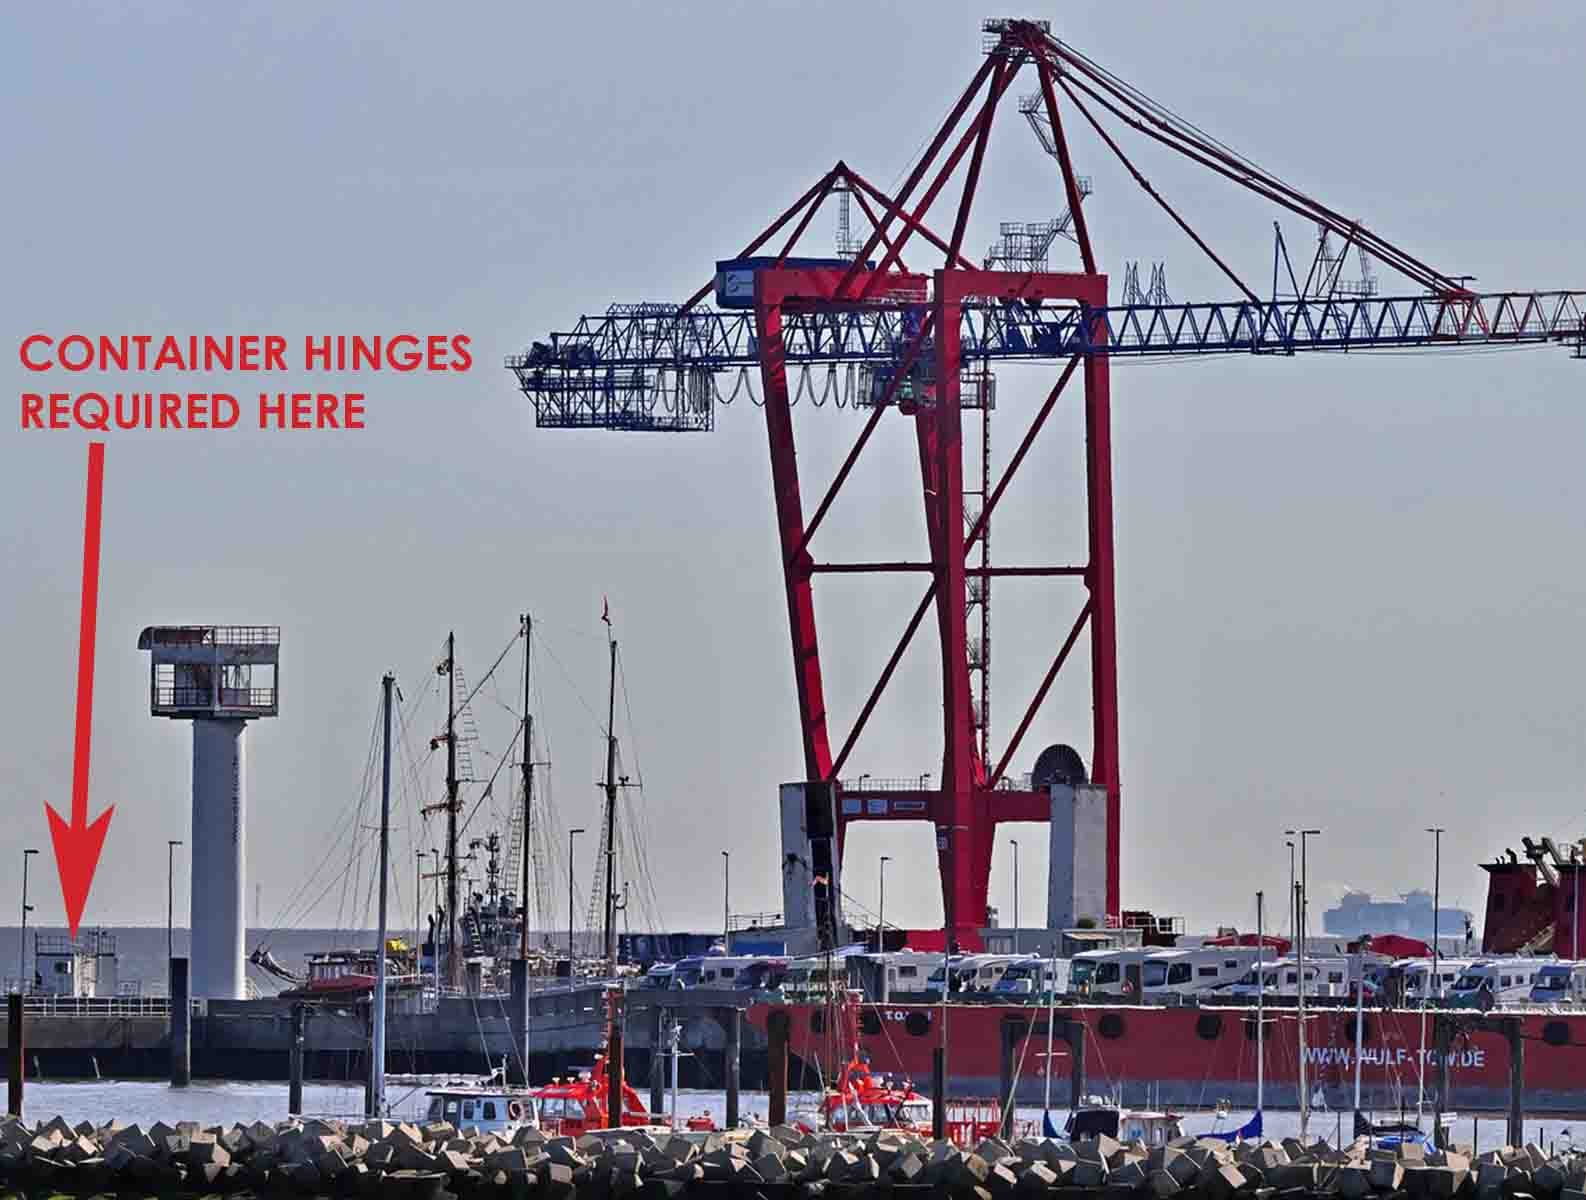 Port images